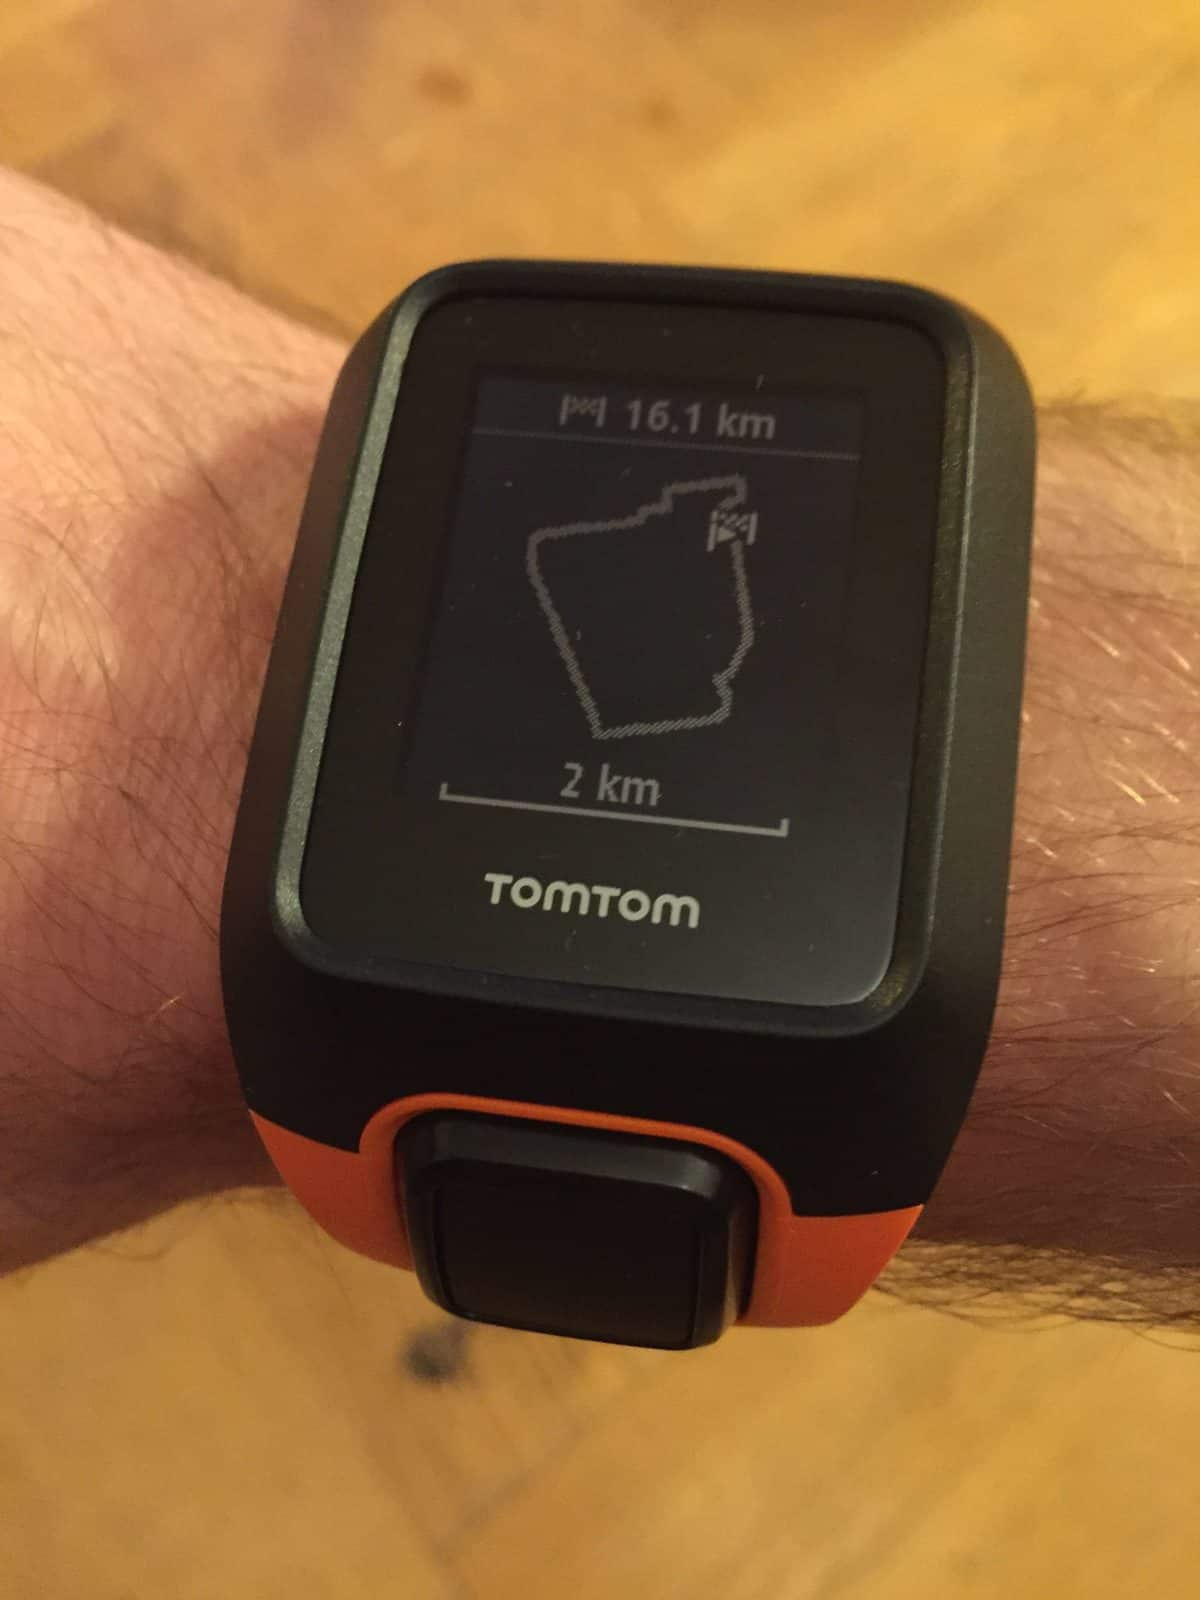 Tomtom Adventurer: aperçu du parcours